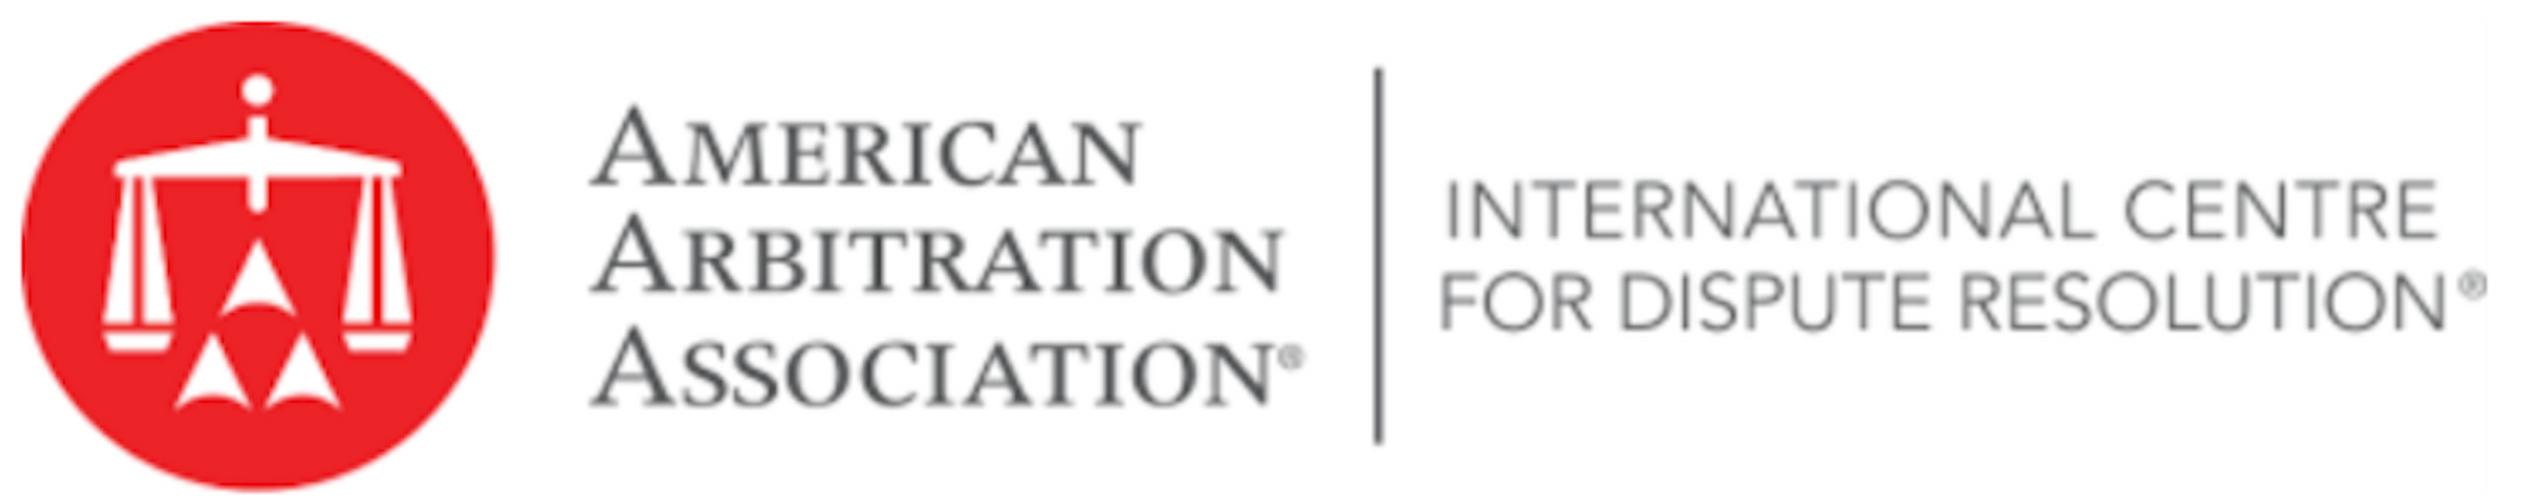 AAA-ICDR Logo.png